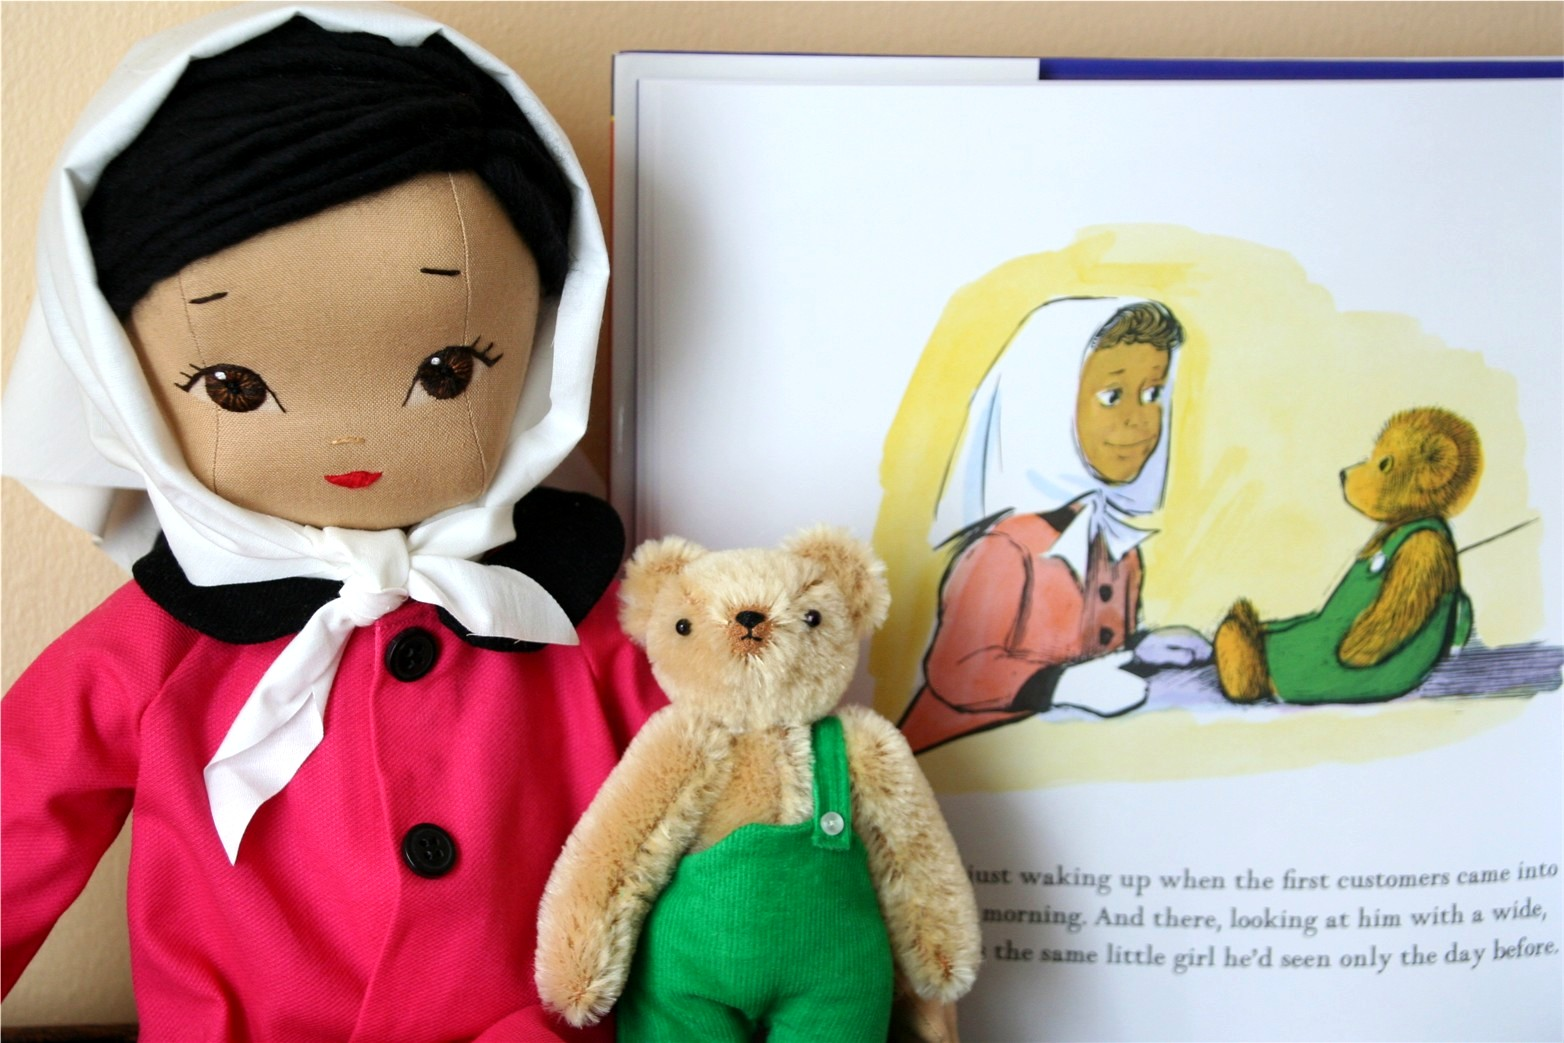 bybido: Meet Lisa and Corduroy the Bear